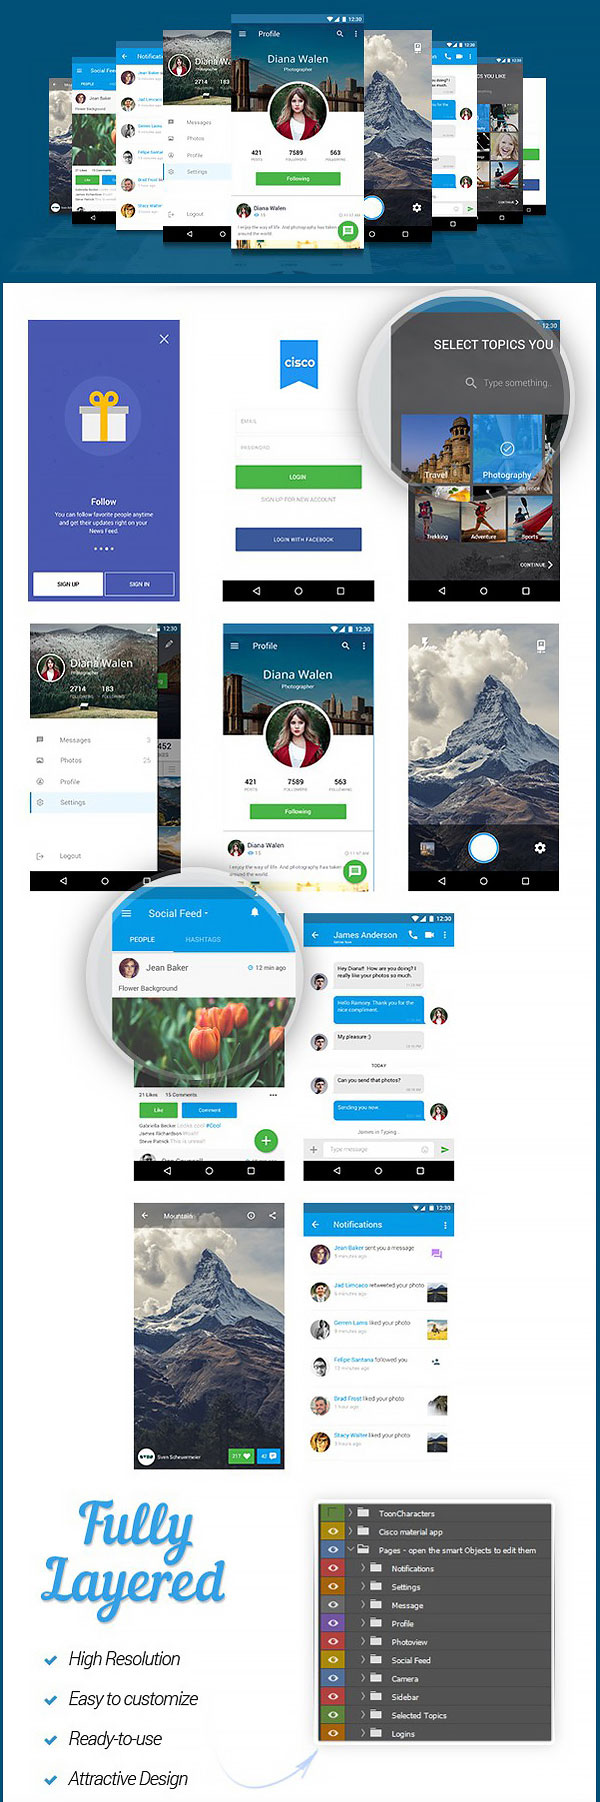 p549 - طرح آماده اپلیکیشن شبکه اجتماعی فوق العاده زیبا / اینترفیس UX و UI موبایل اندورید و ios با صفحات کاربردی و متنوع